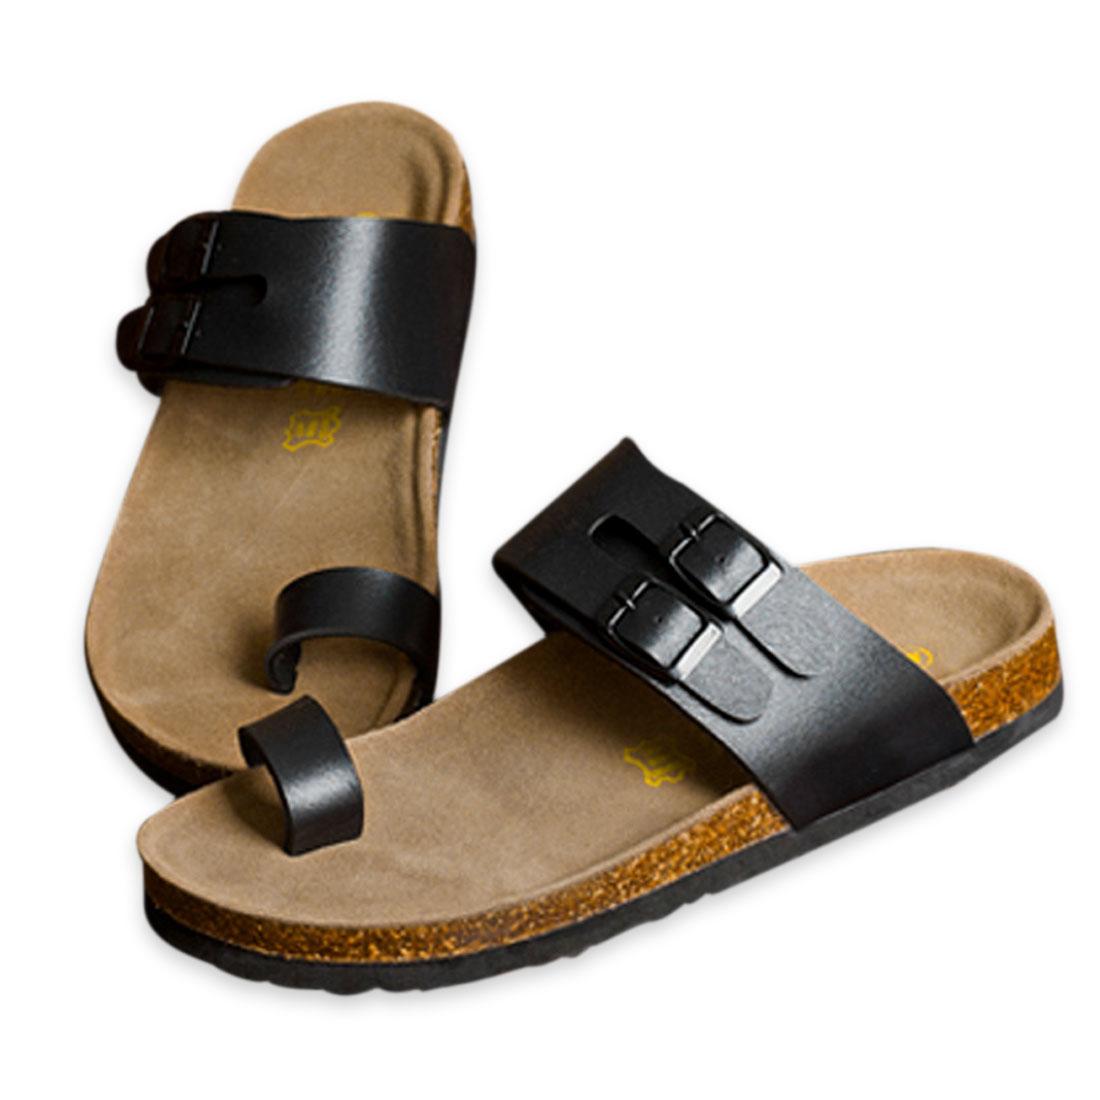 Men Waterproof Sole Roomy Toe Box Gentle Footbed Sandal Black US Size 8